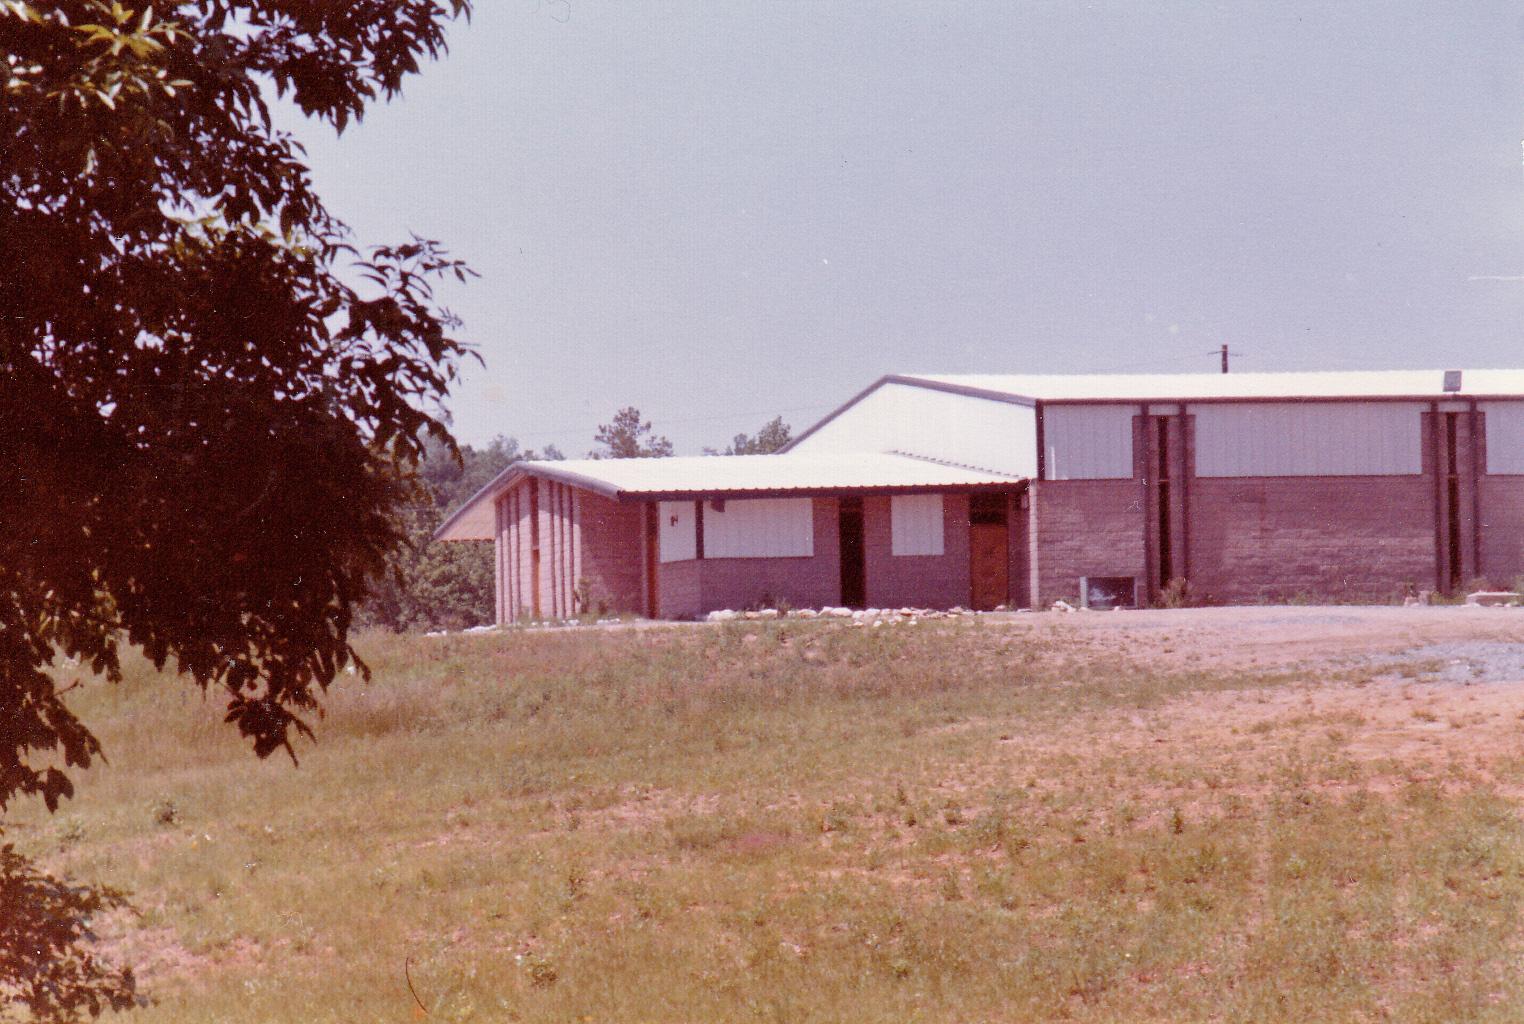 Temporary meeting place: Kannapolis, NC  October 23, 1983